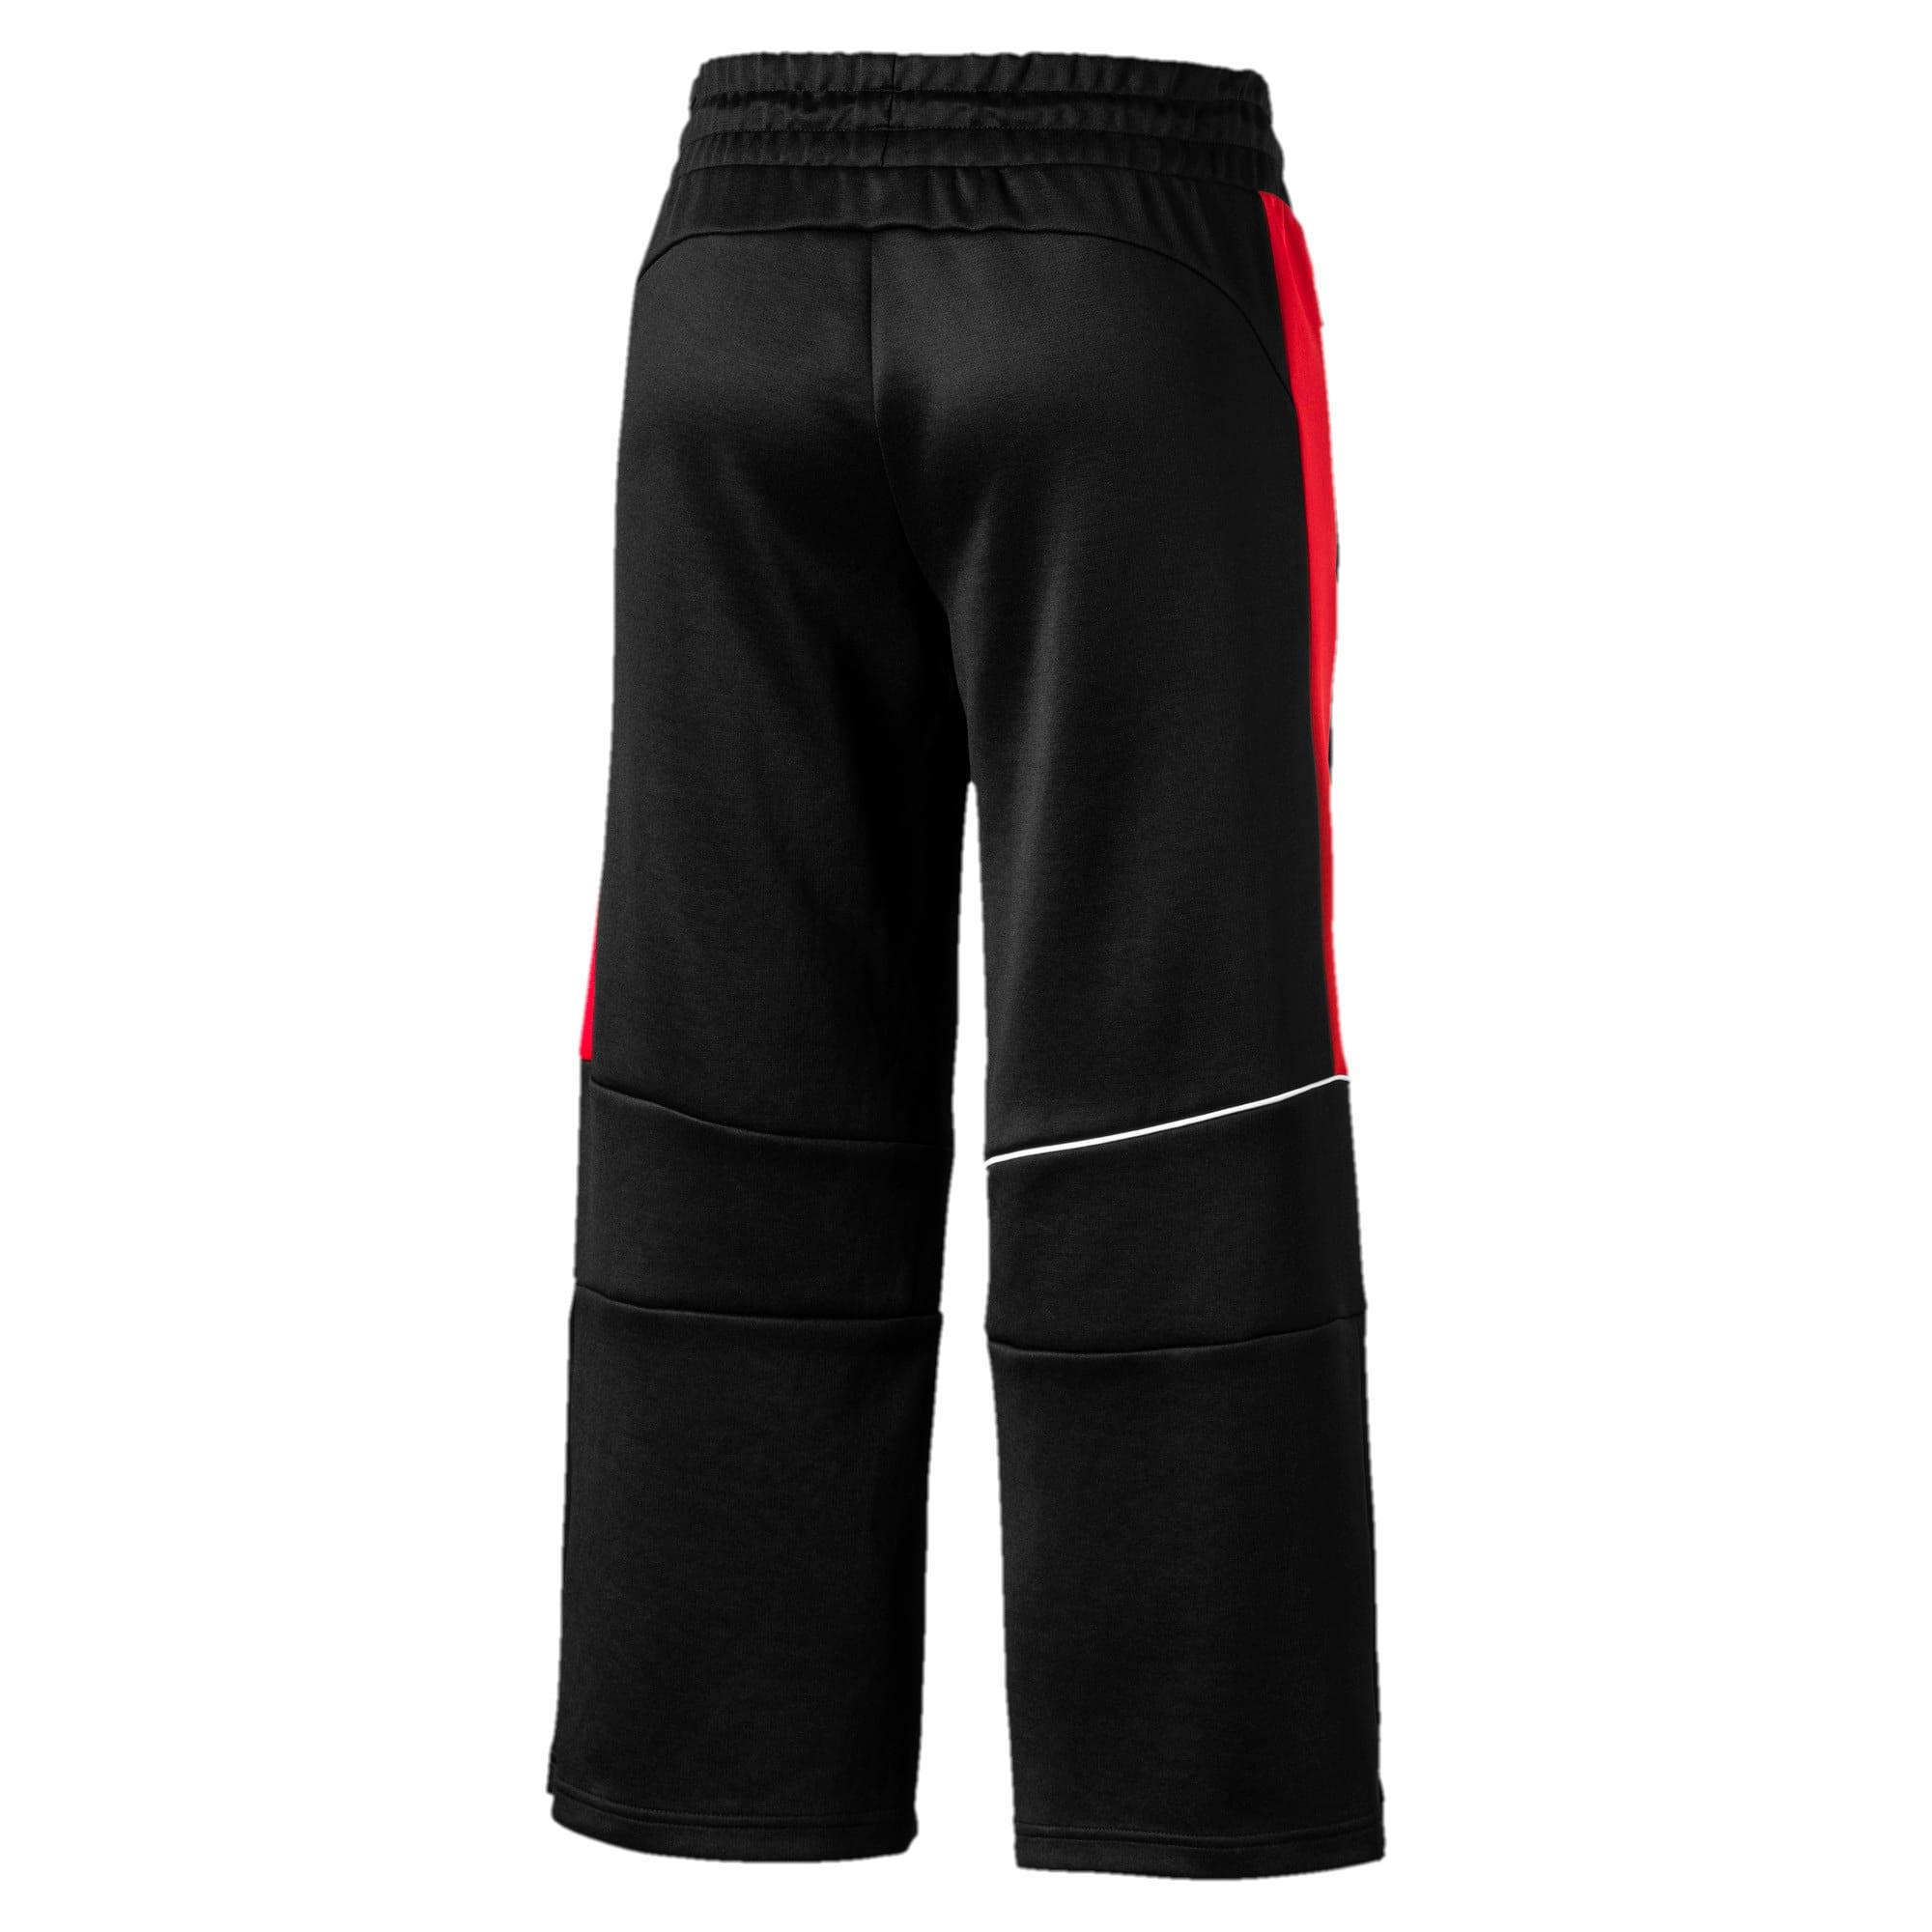 Thumbnail 5 of SF Wmn Track Pants, Puma Black, medium-IND